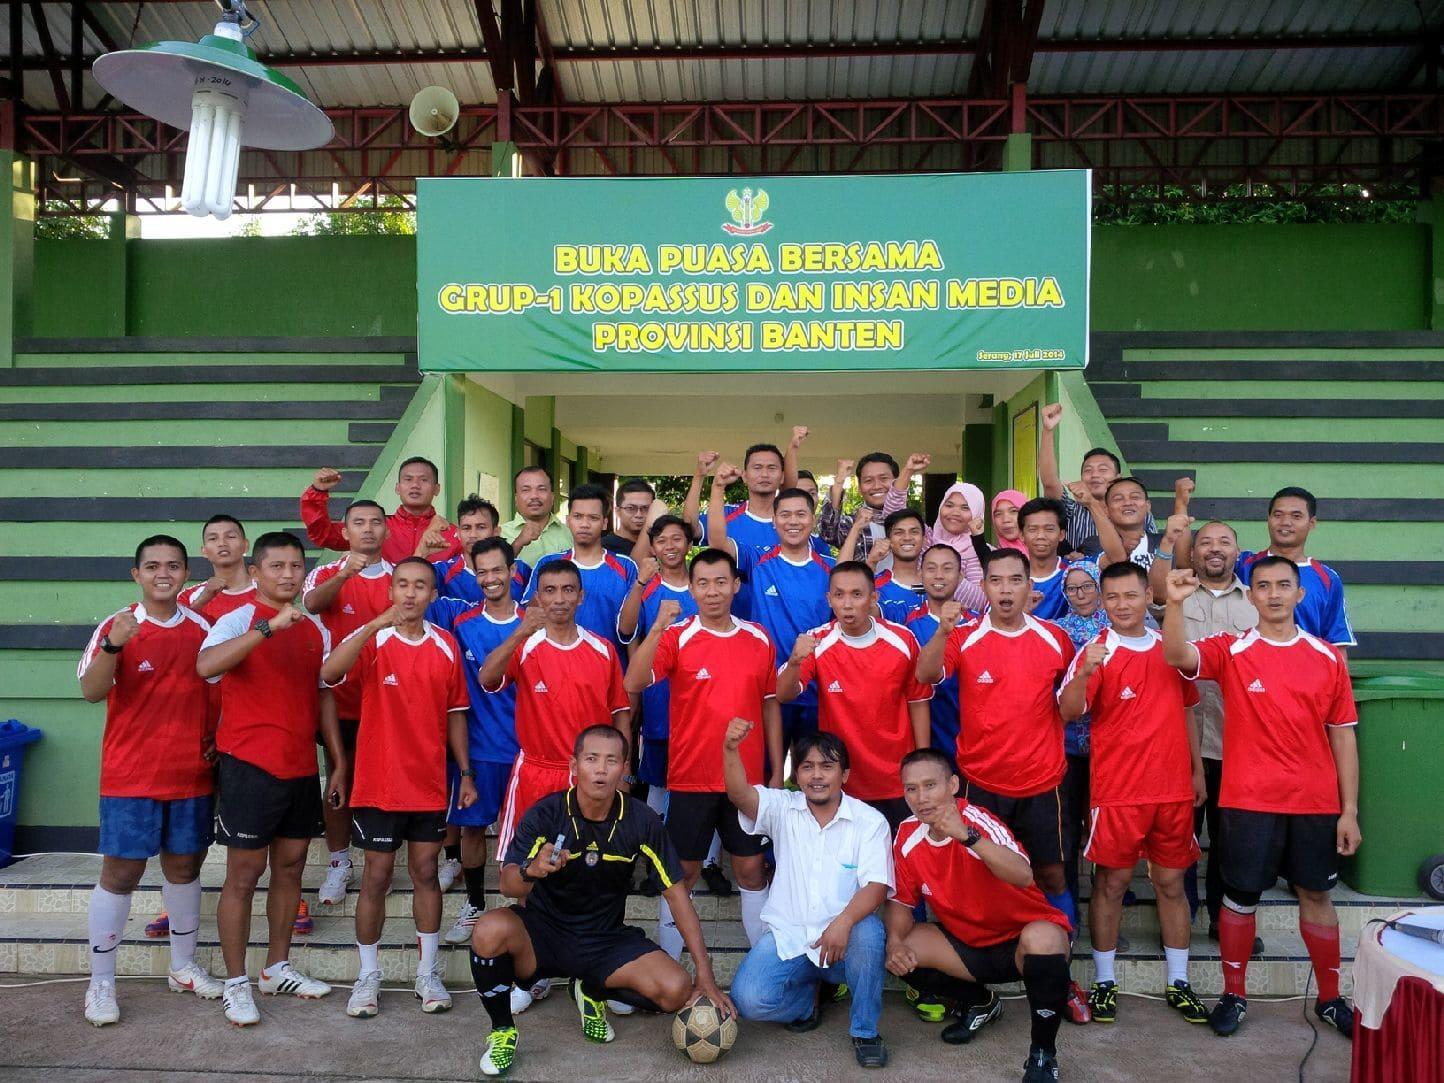 Buka Puasa bersama Grup-1 Kopassus dan Insan media provinsi Banten